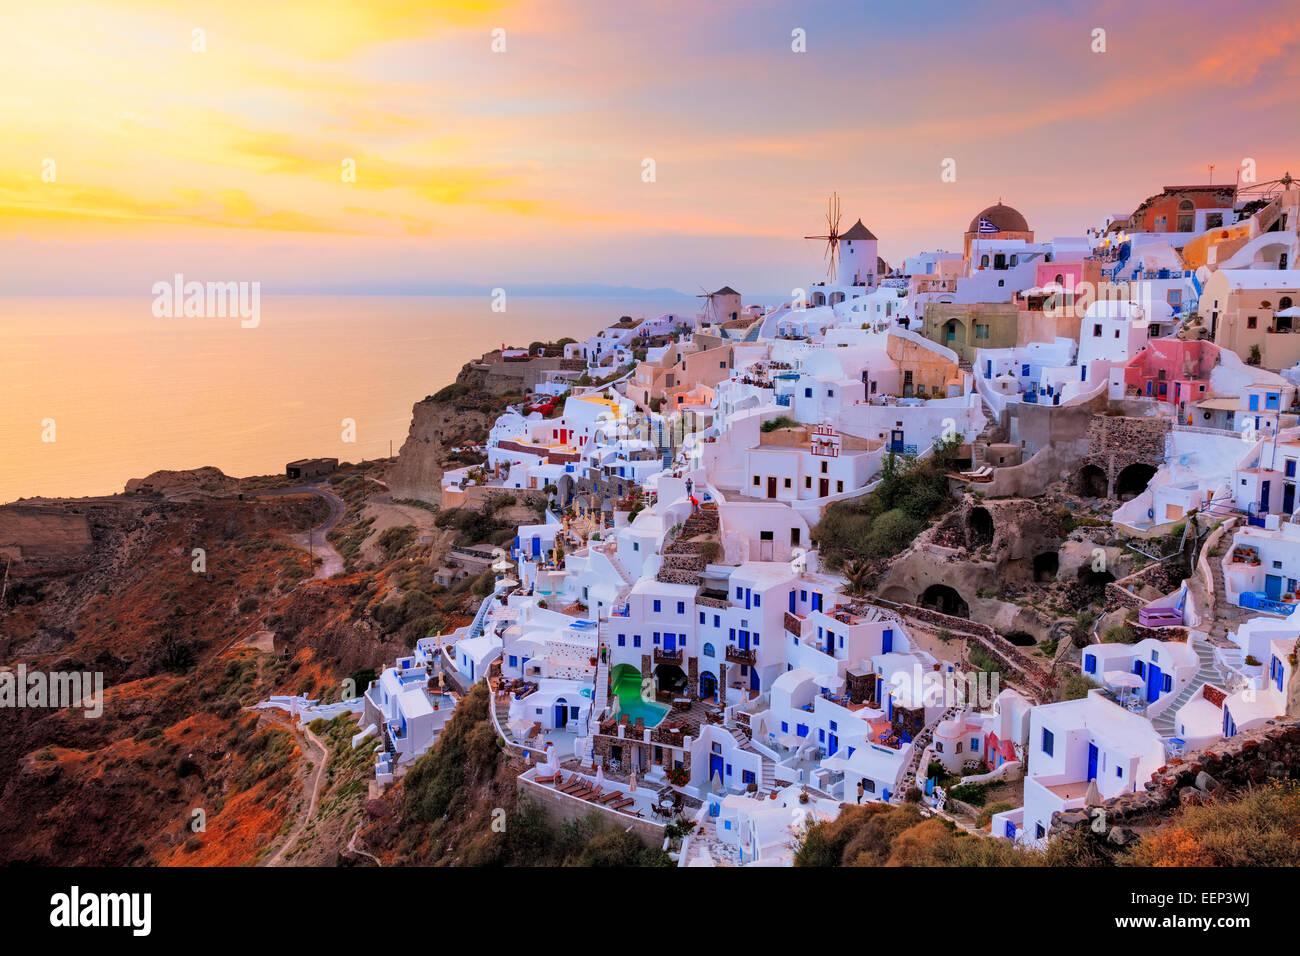 Vibrante atardecer en casas y chalets en Oia, Santorini, Grecia Imagen De Stock